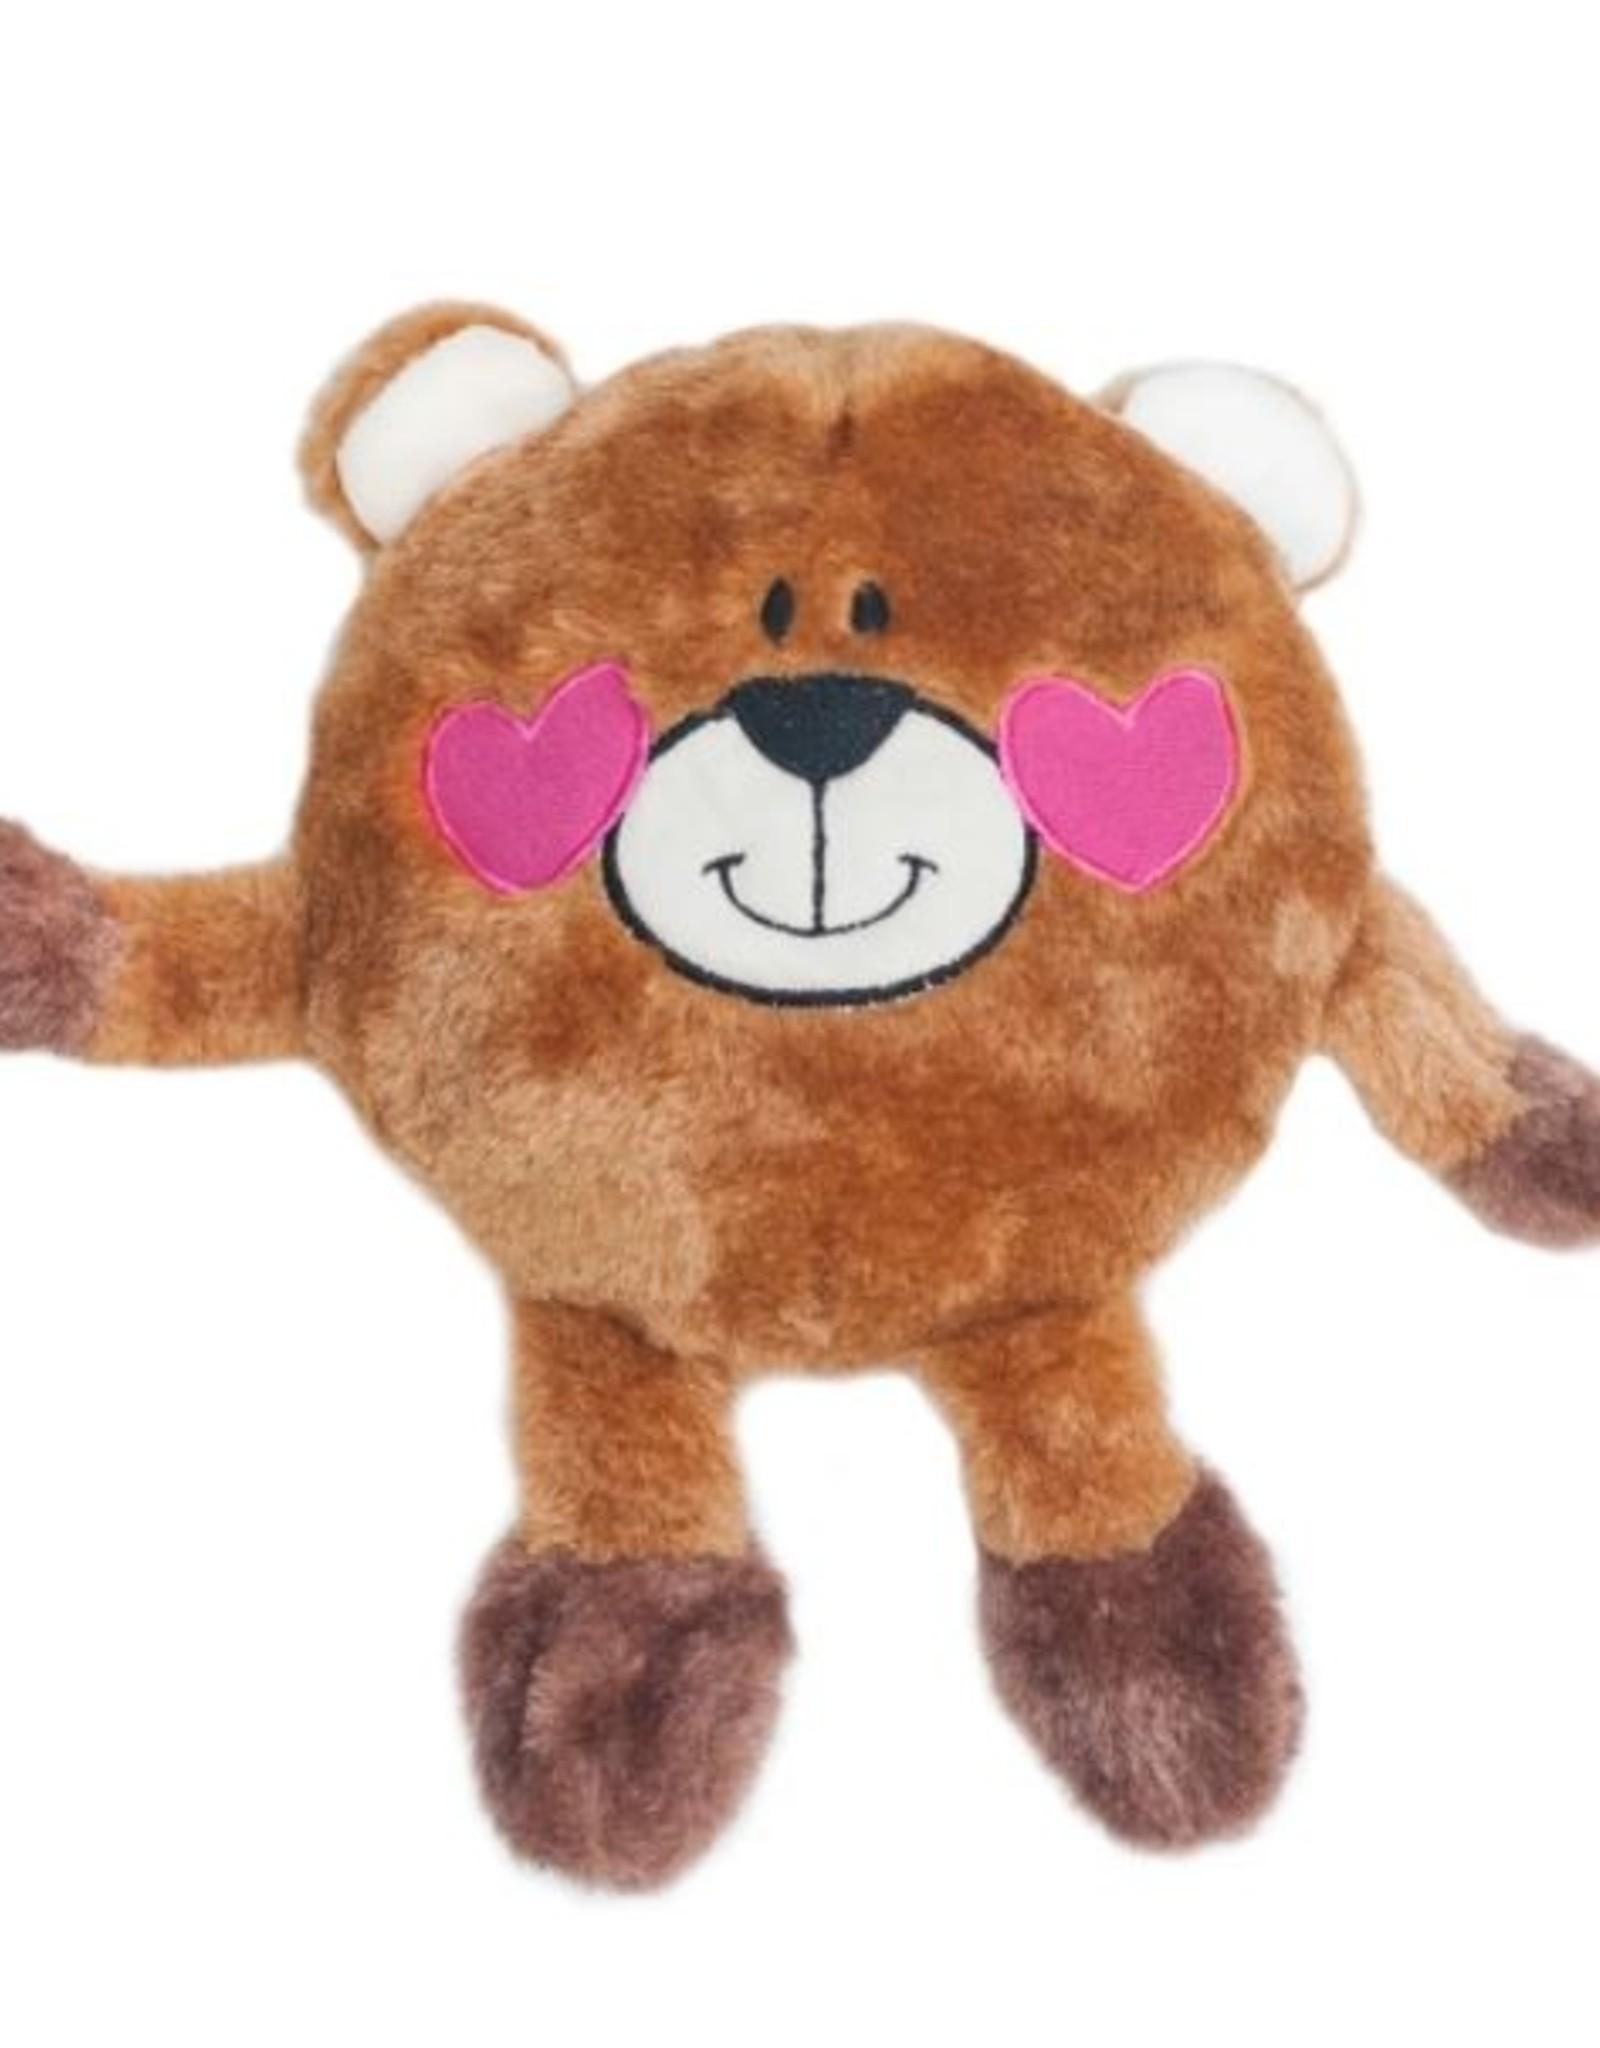 ZippyPaws Brainey Bear in Love